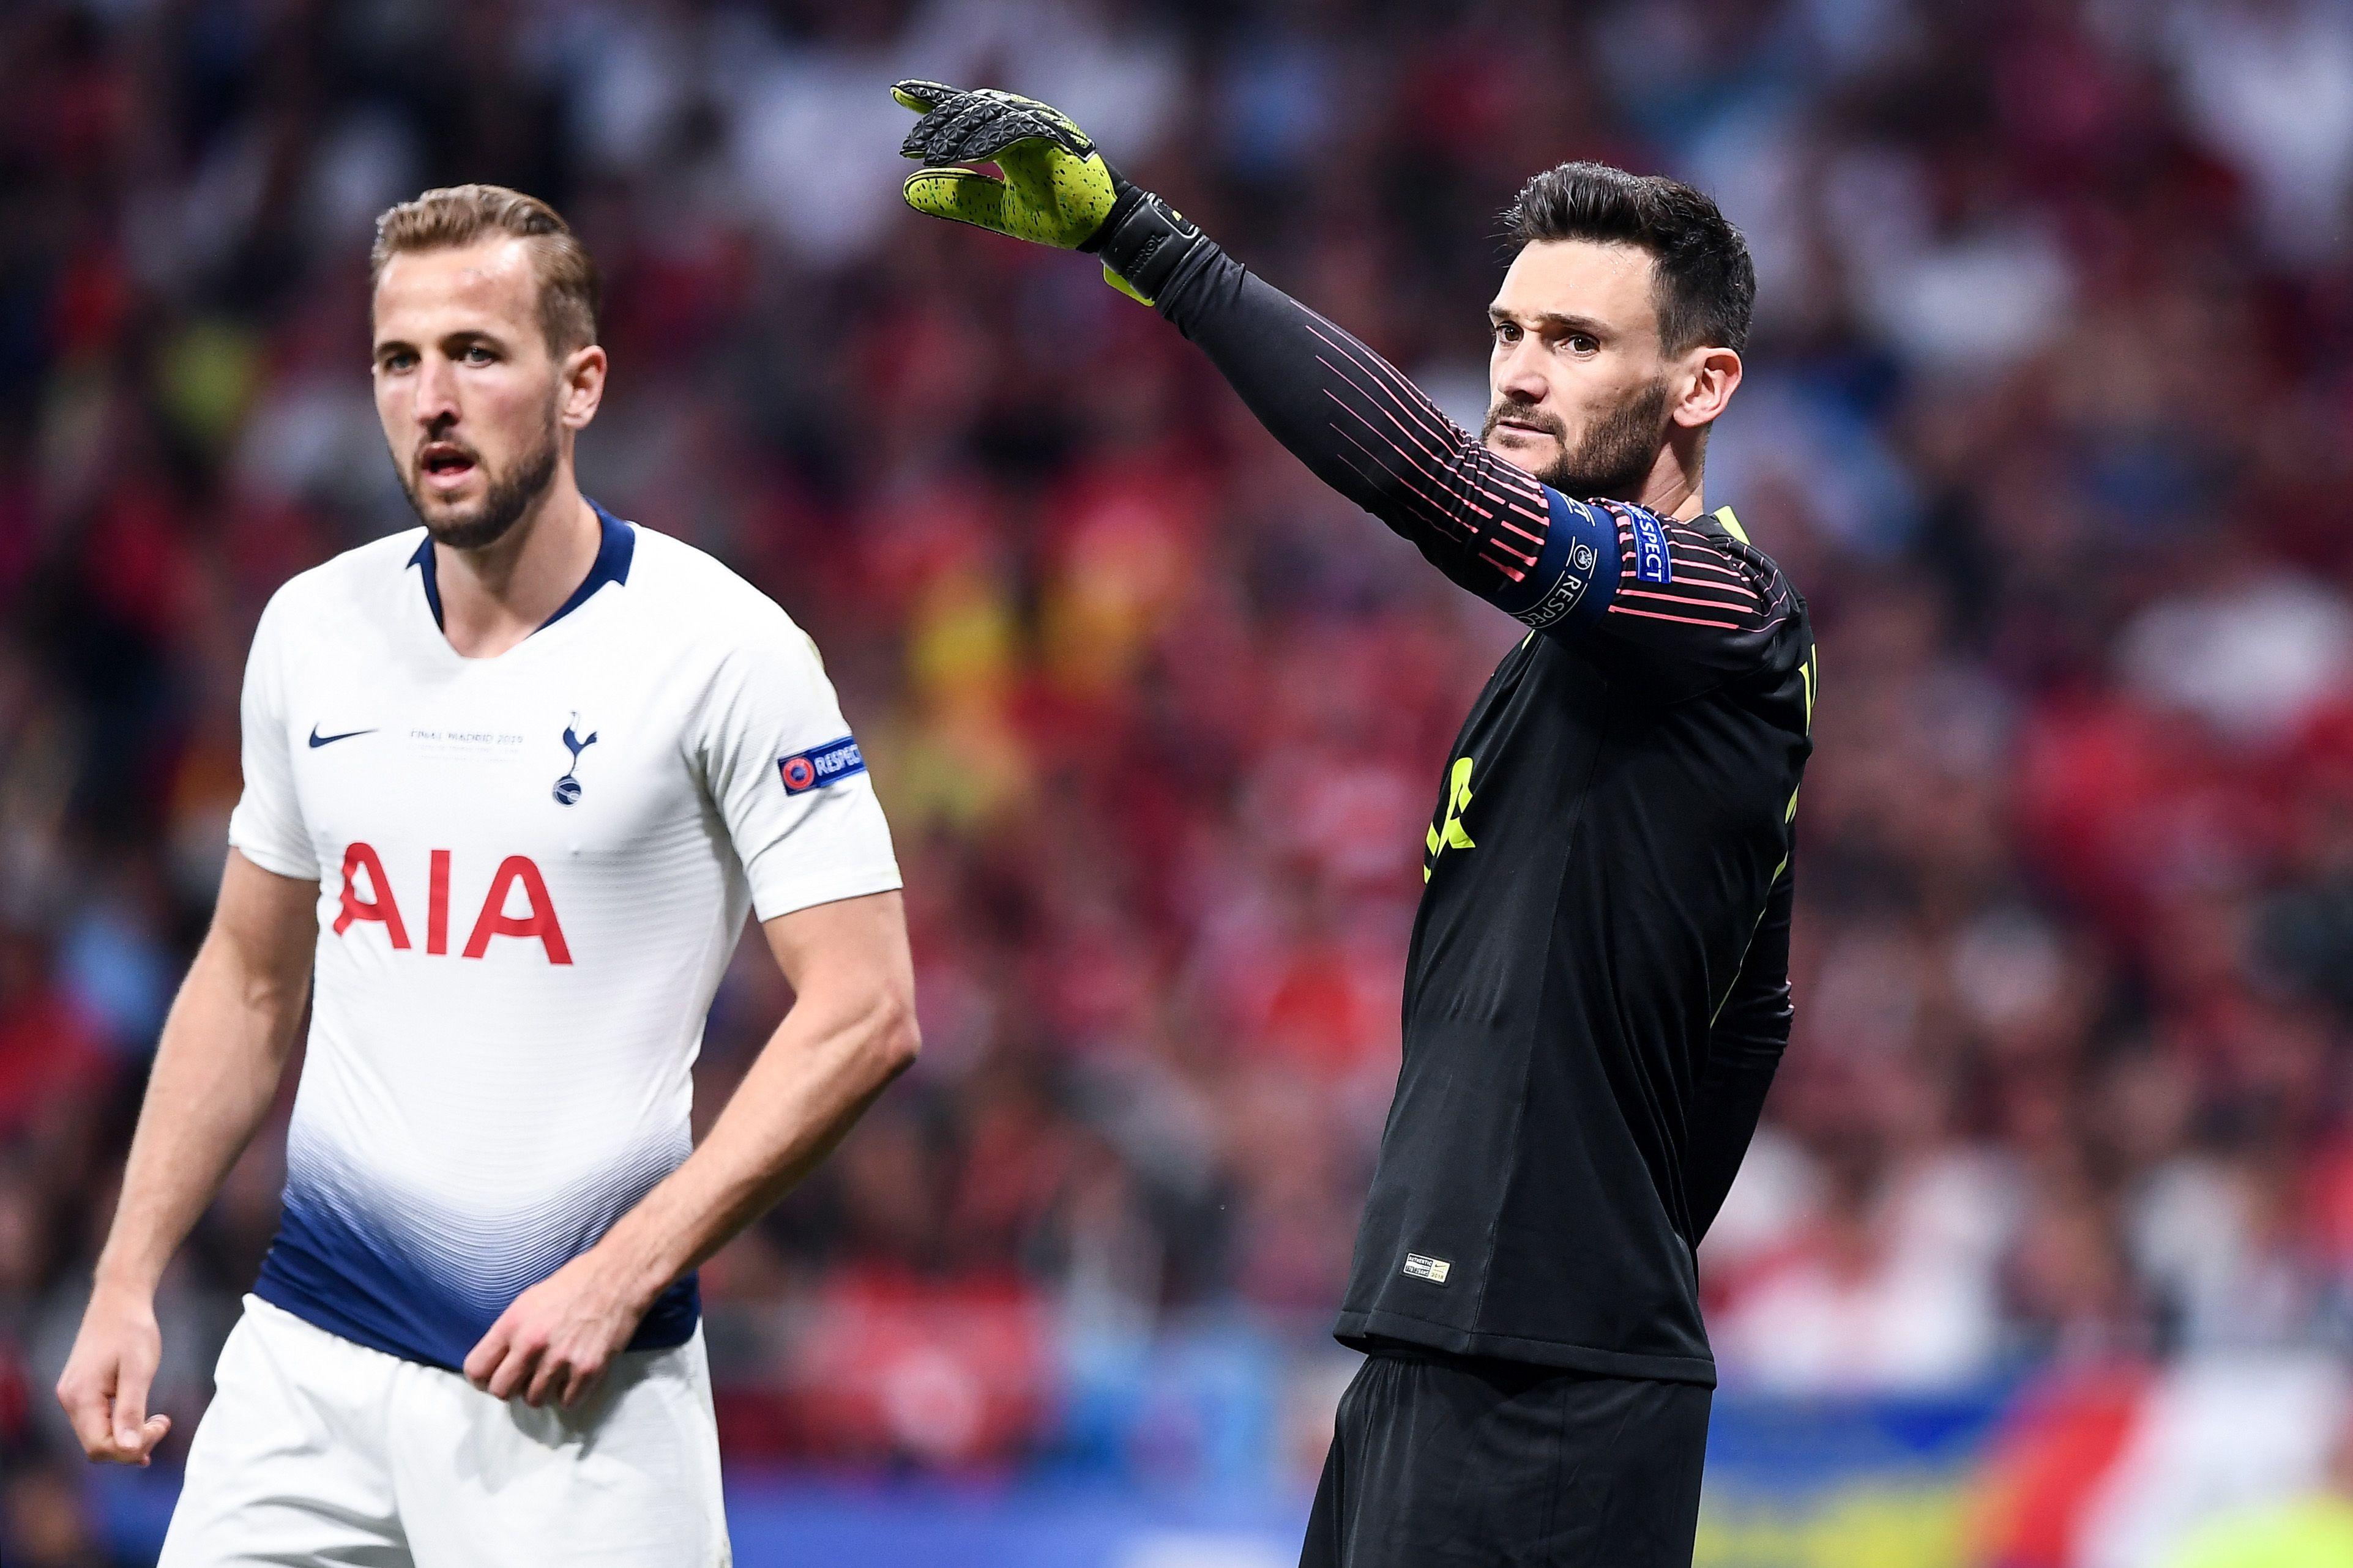 Football - Ligue des champions - Ligue des champions : Olympiakos-Tottenham en direct